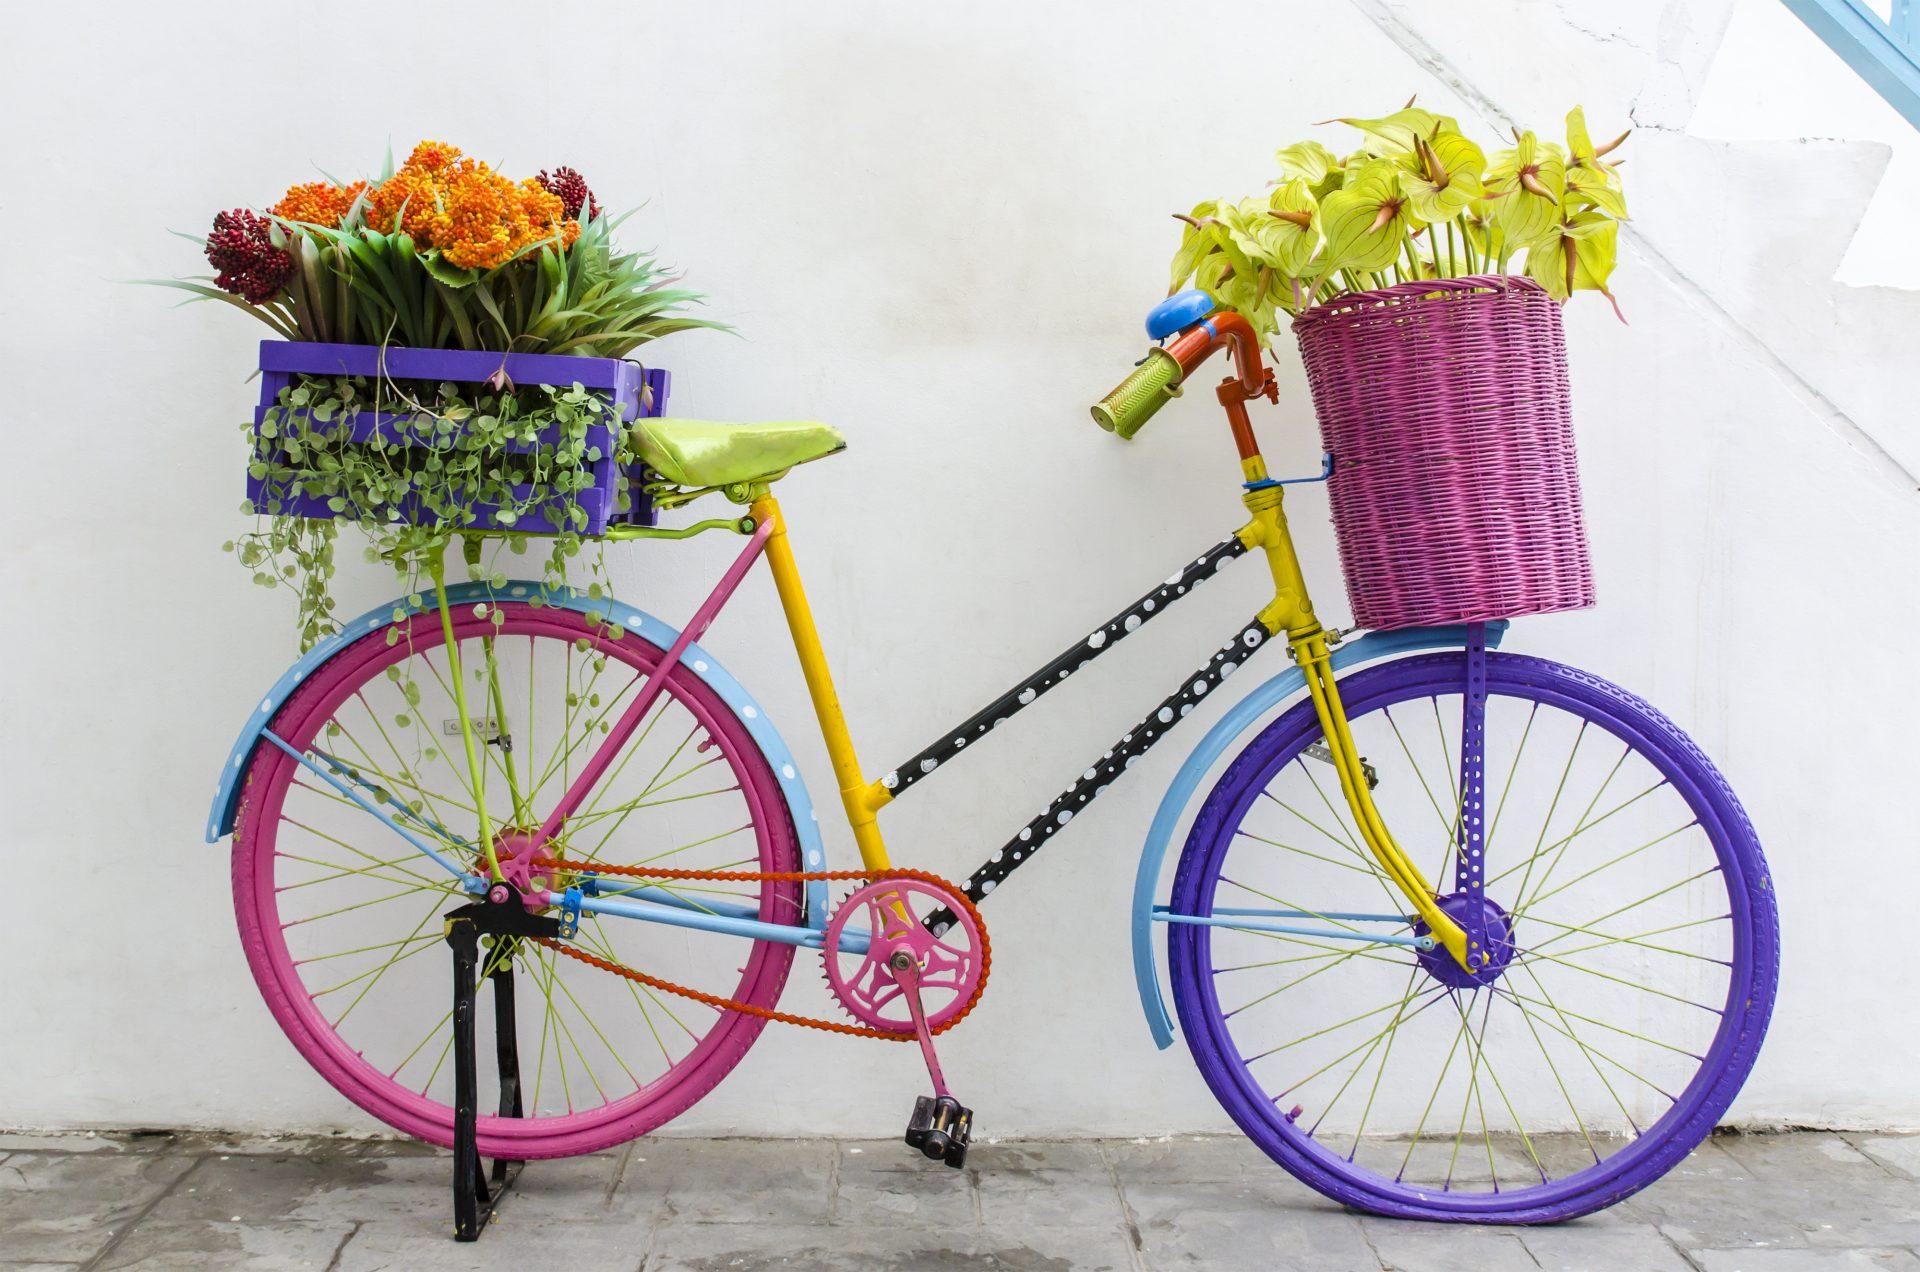 Decorated bike